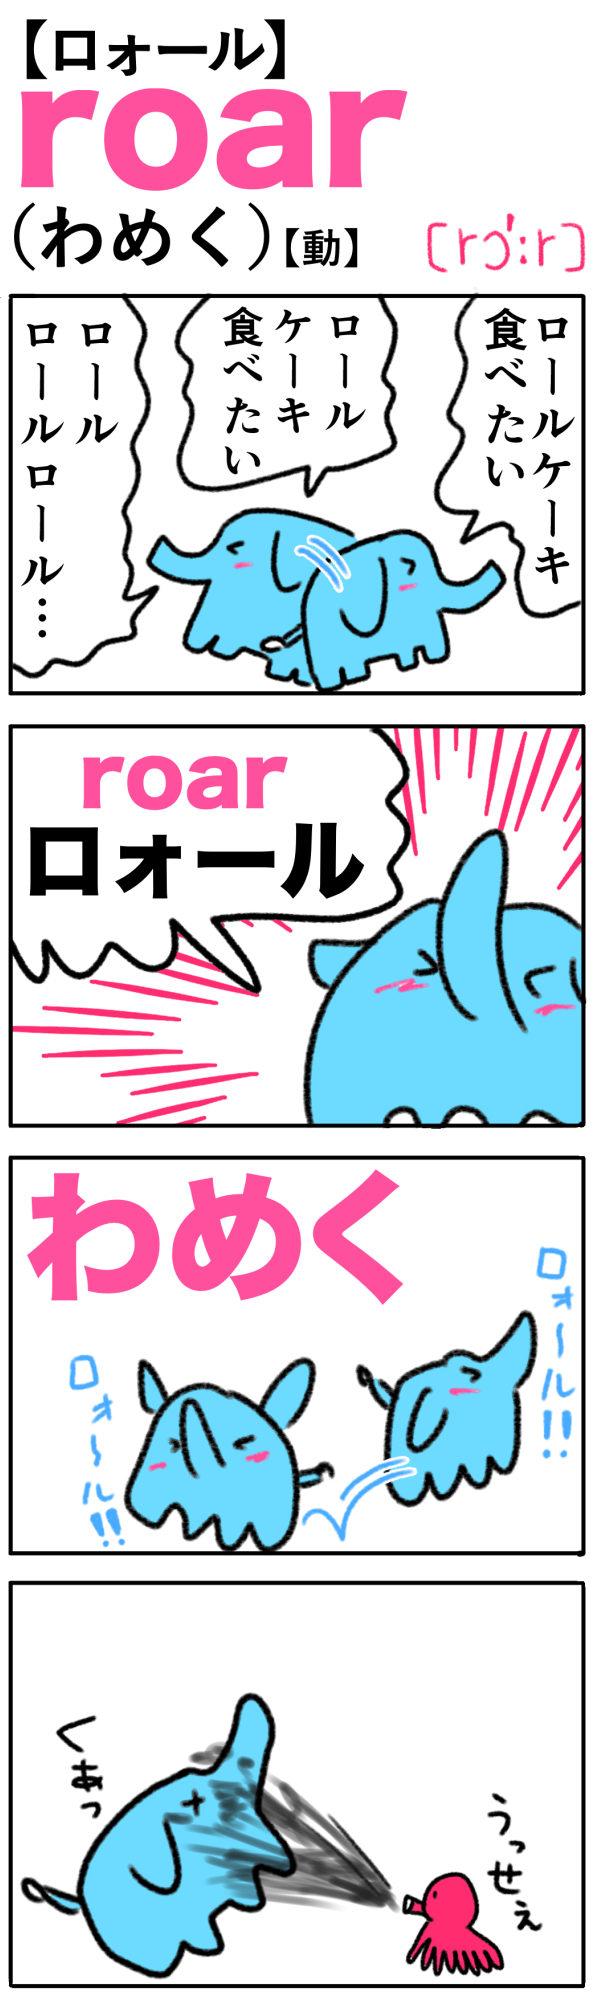 roar(わめく)の語呂合わせ英単語